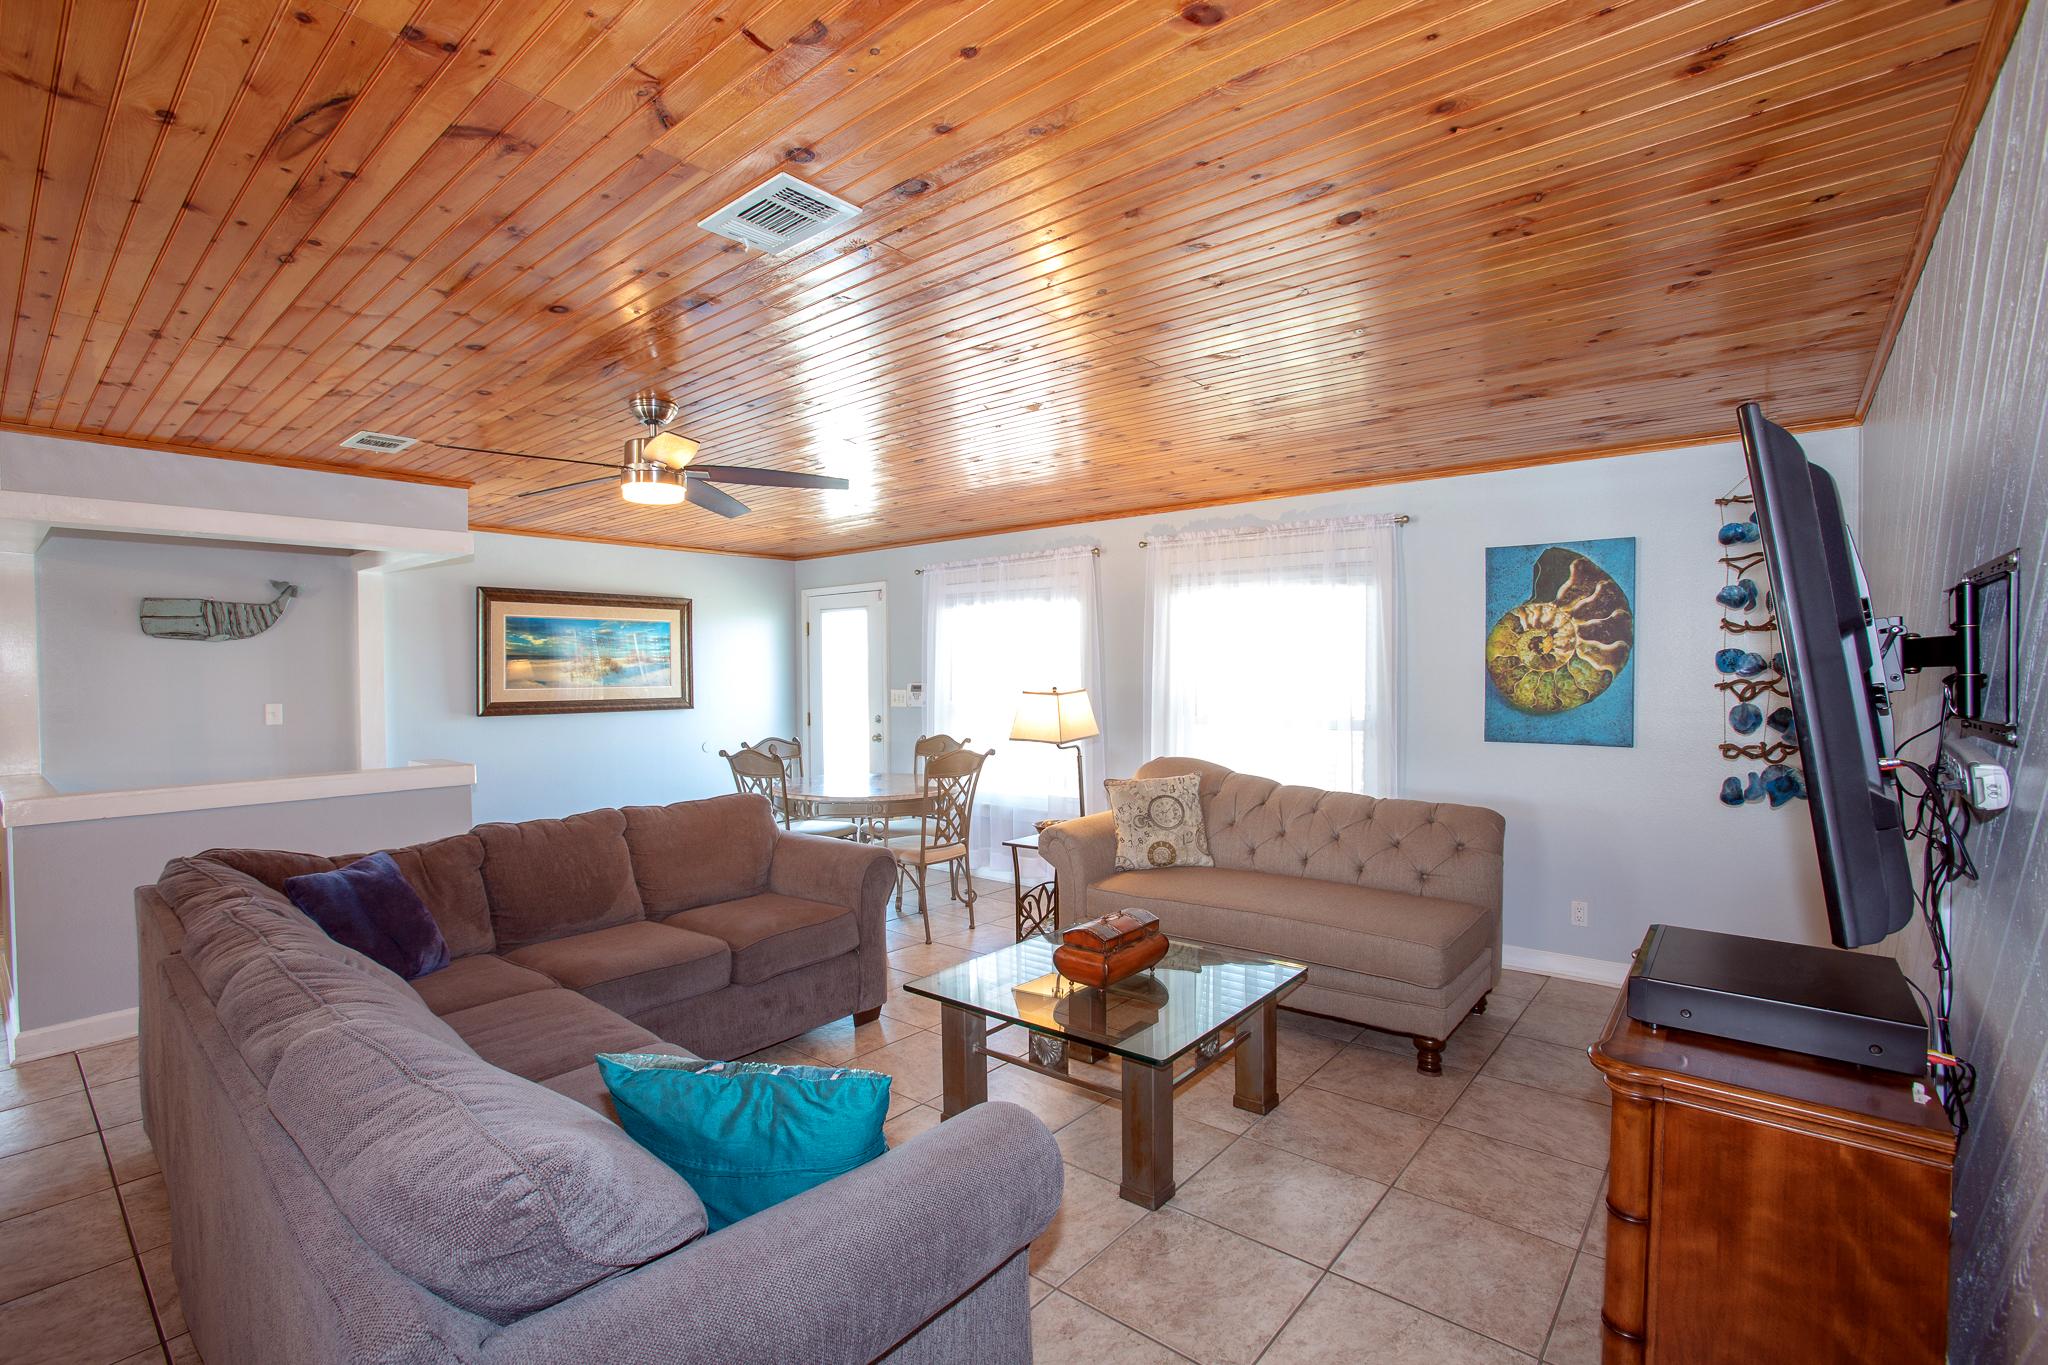 Maldonado 1015 - Sea the Big Picture House/Cottage rental in Pensacola Beach House Rentals in Pensacola Beach Florida - #6